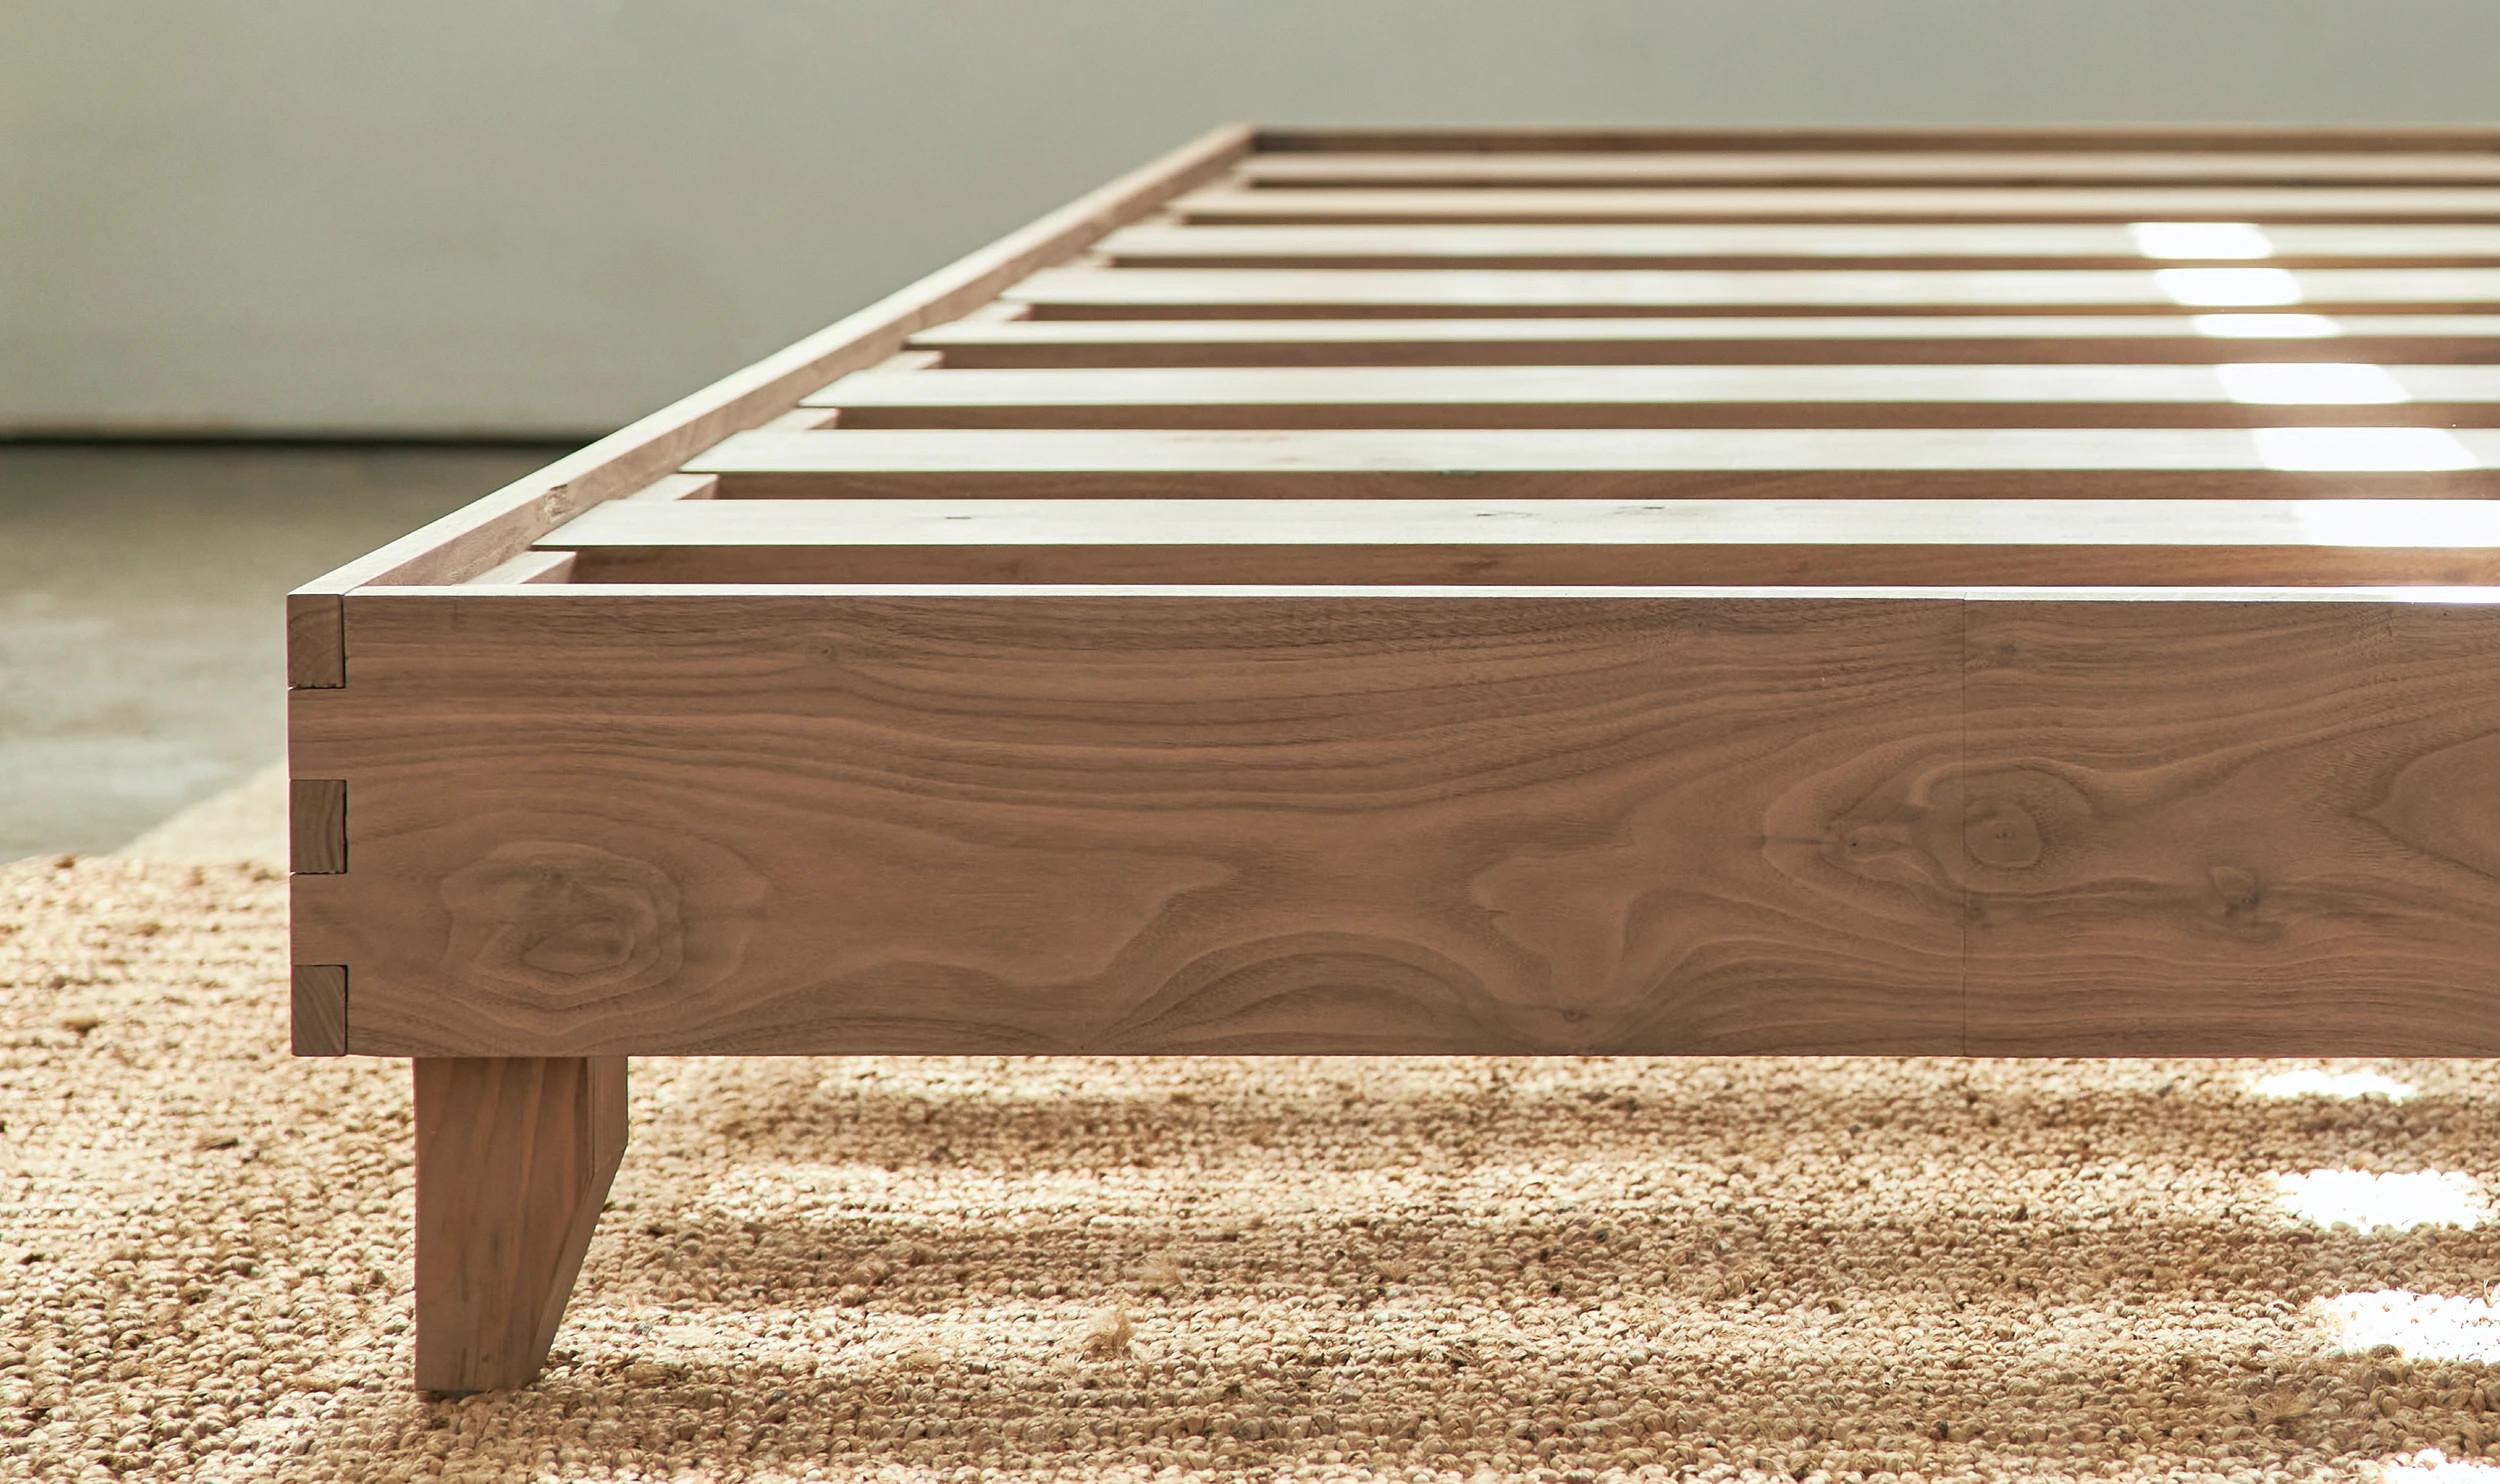 american made refurbished wooden bed frames